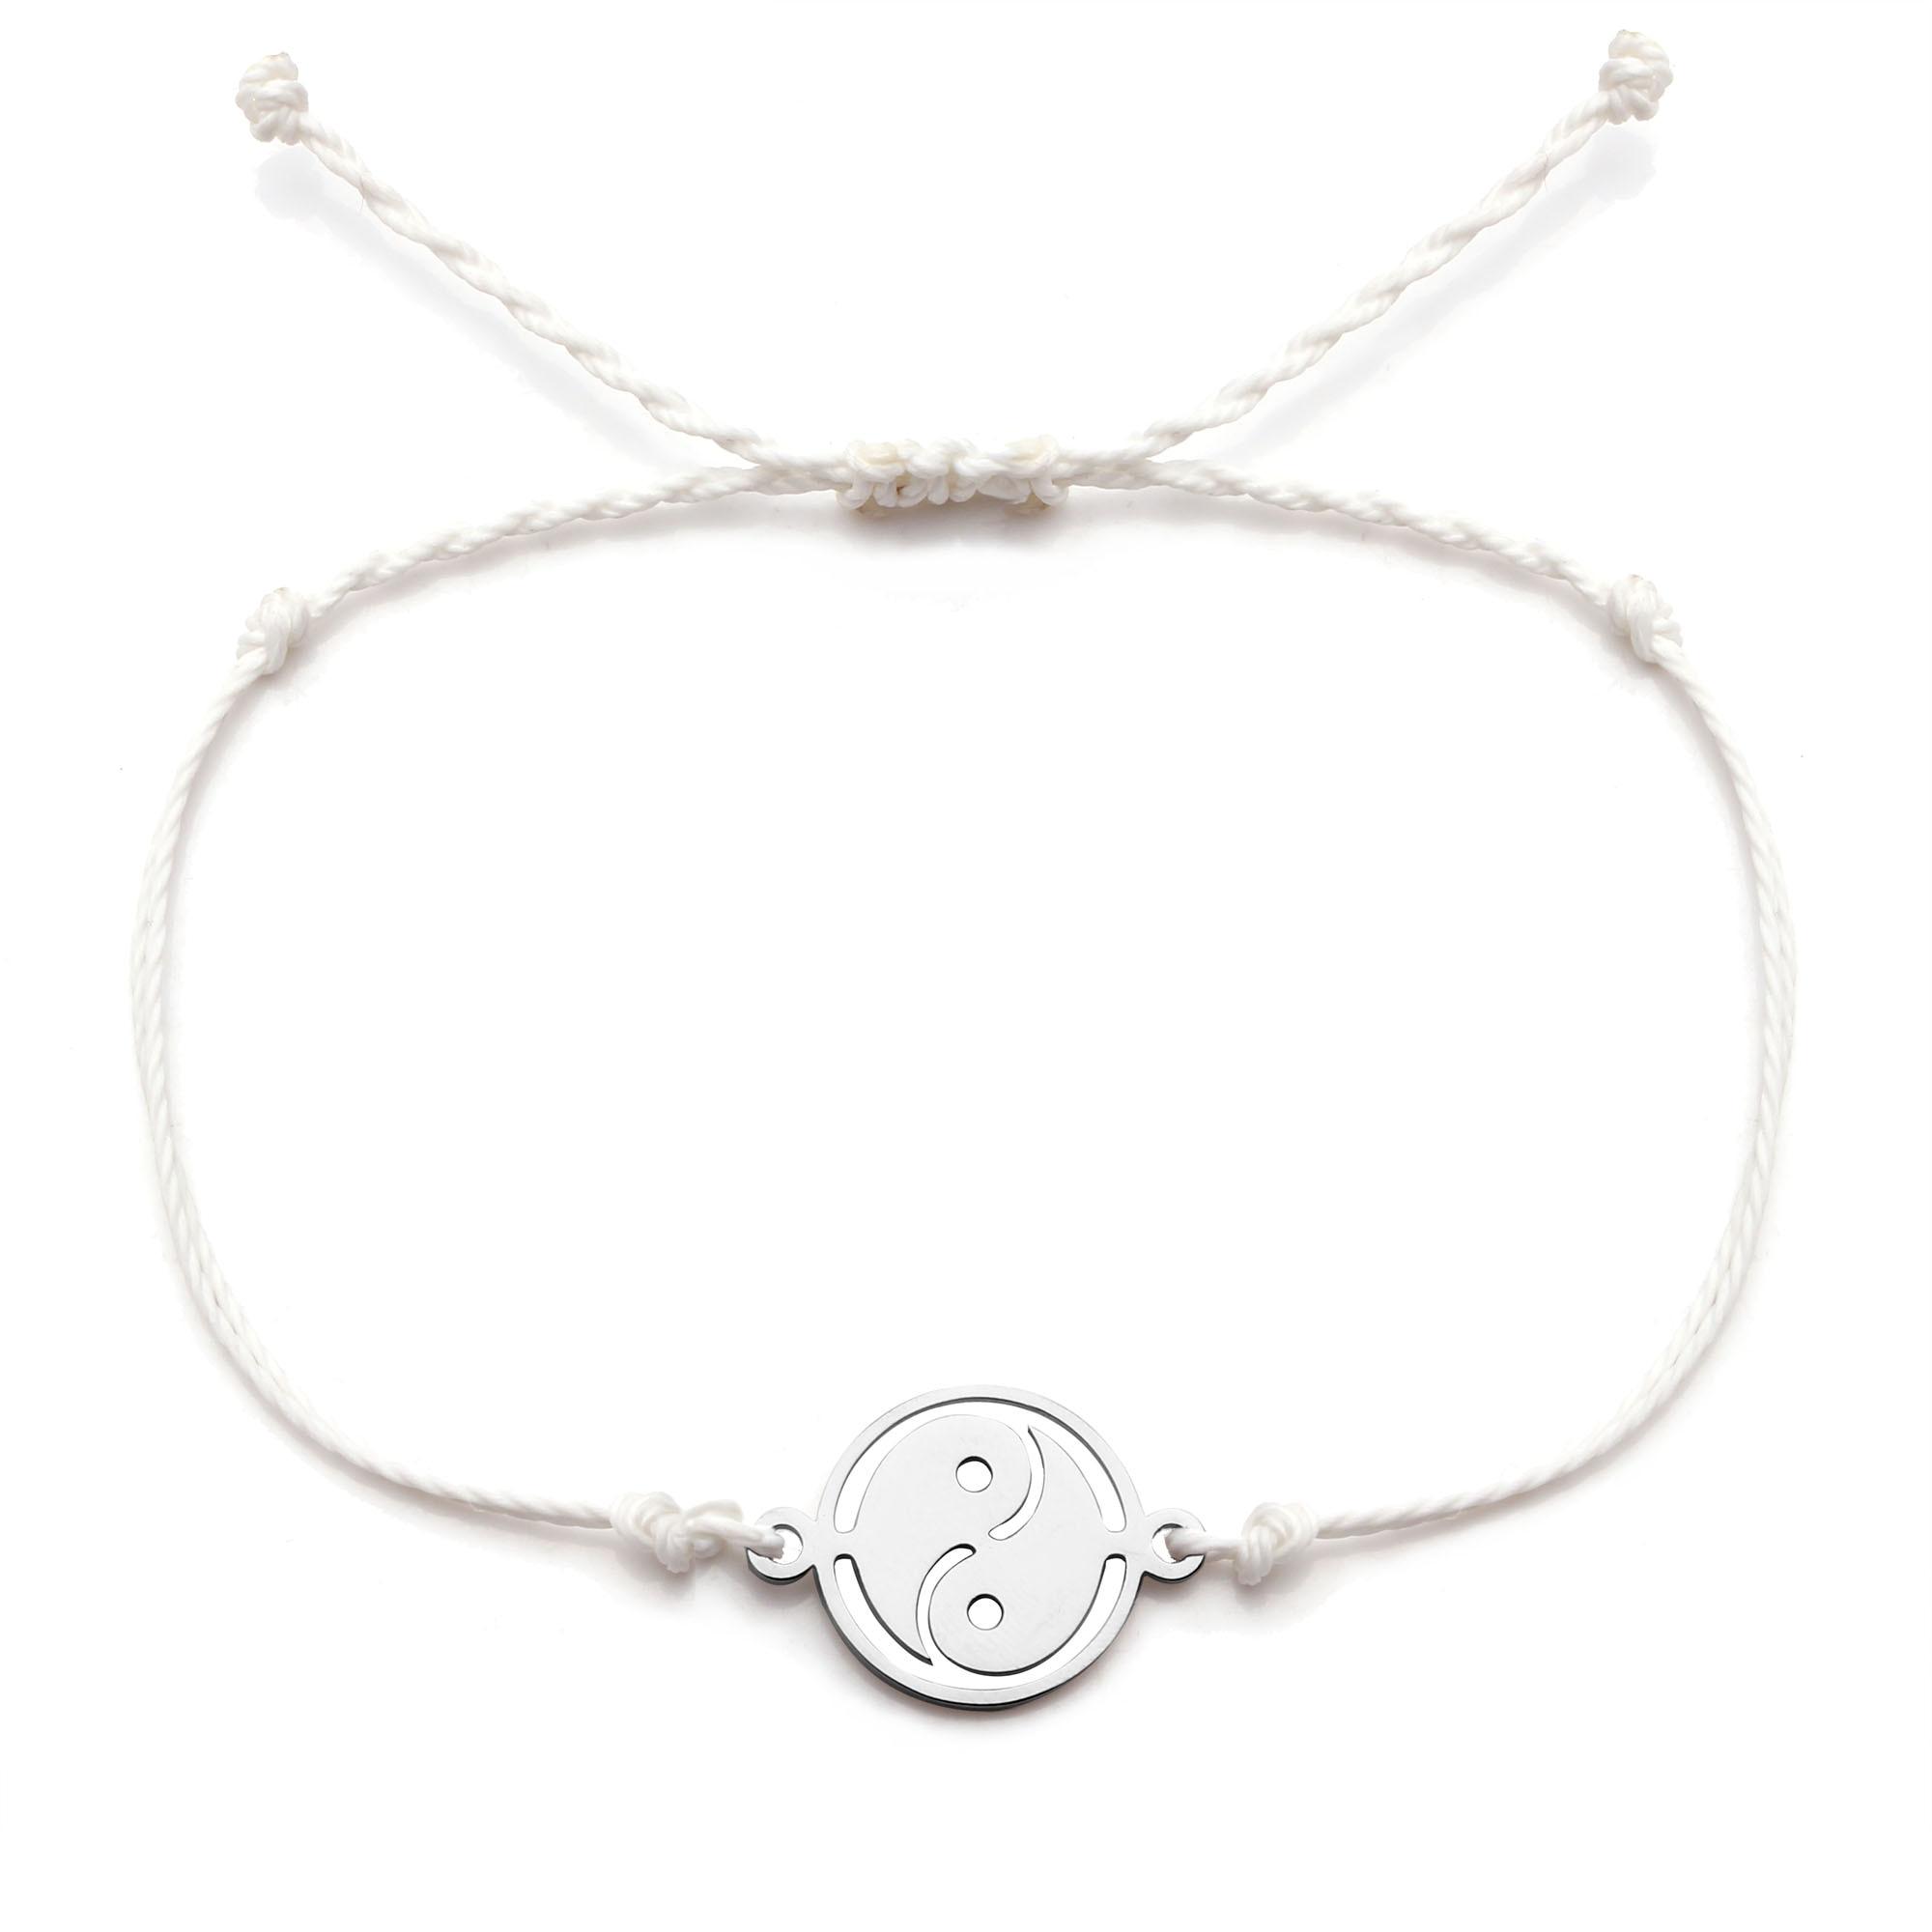 Pouco aço inoxidável tai ji yin e yang charme pulseira feminino branco azul preto cabo encerado artesanal jóias presente